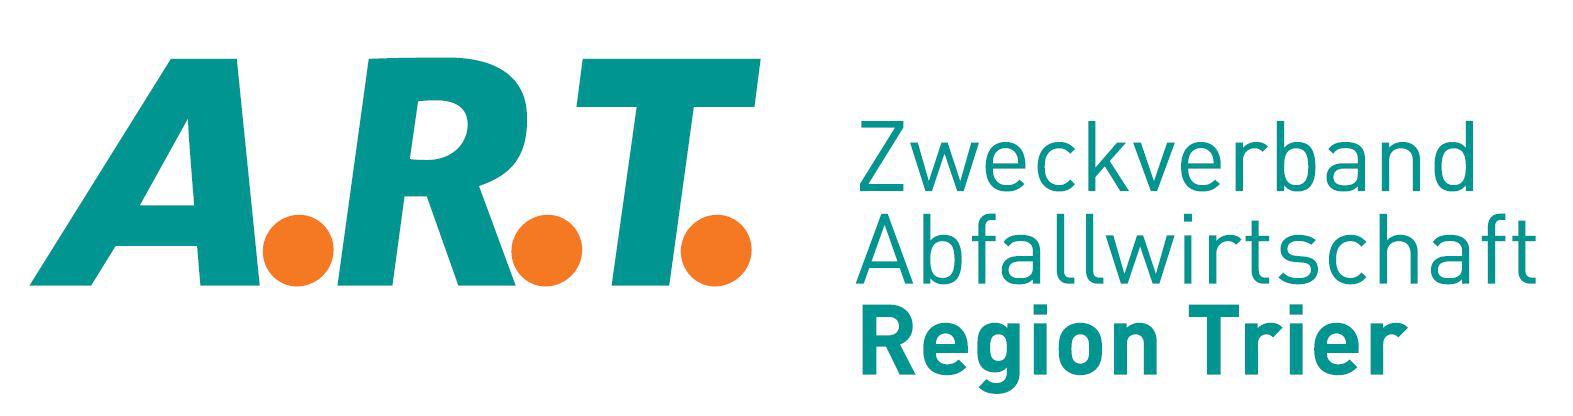 Zweckverband Abfallwirtschaft Region Trier (A.R.T.)